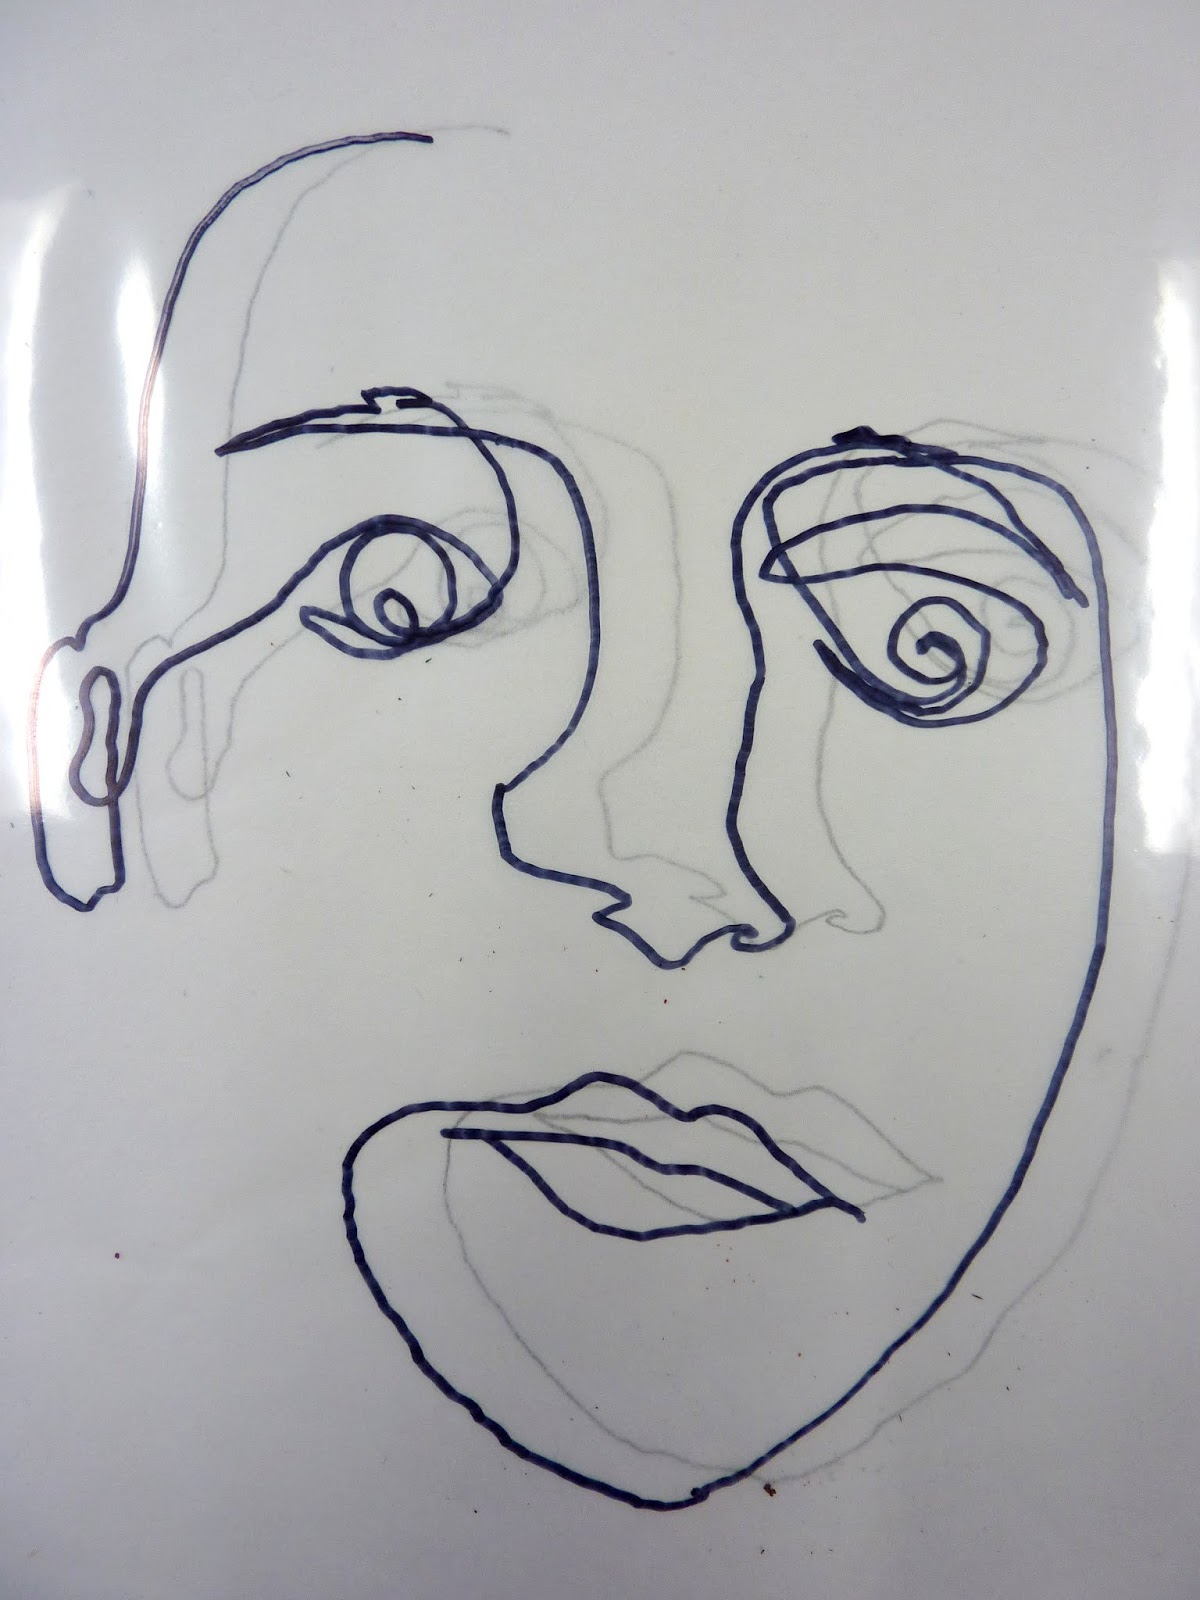 Blind Contour Line Drawing Self Portrait : Picasso inspired portraits art edu